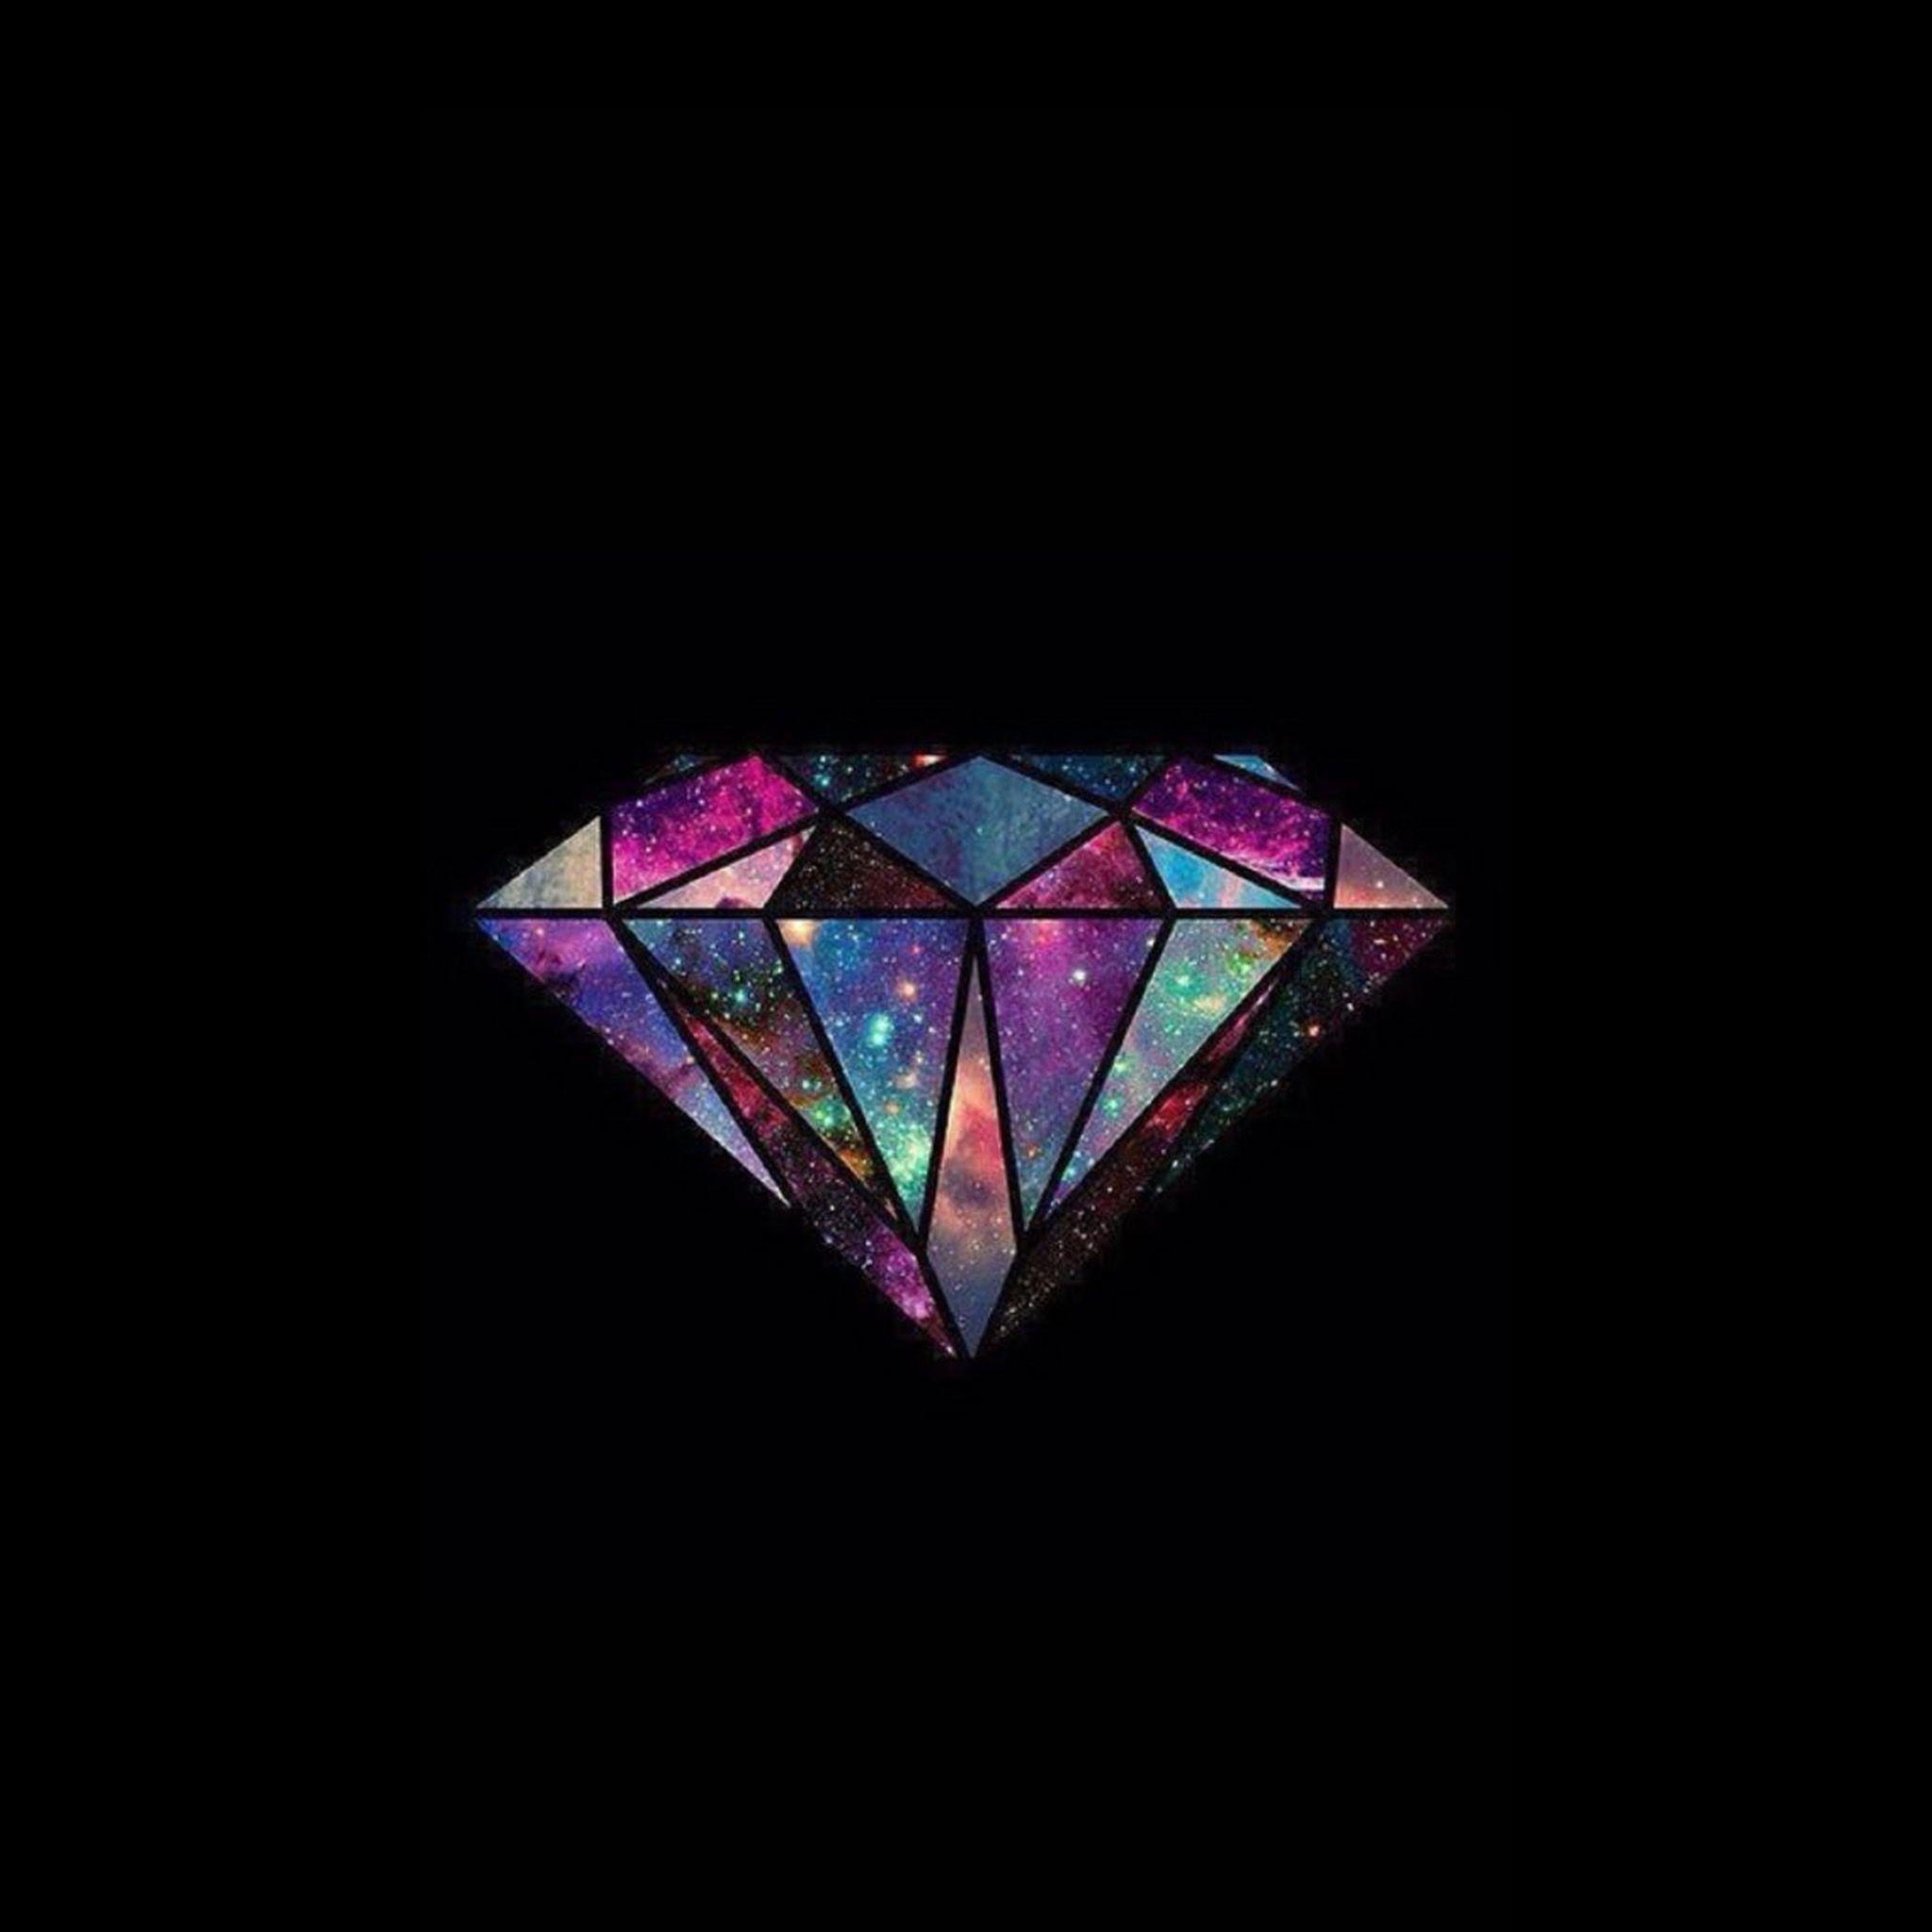 Galaxy Diamond Wallpaper Ilustrasi Vektor Seni Inspirasi Wallpaper Ponsel